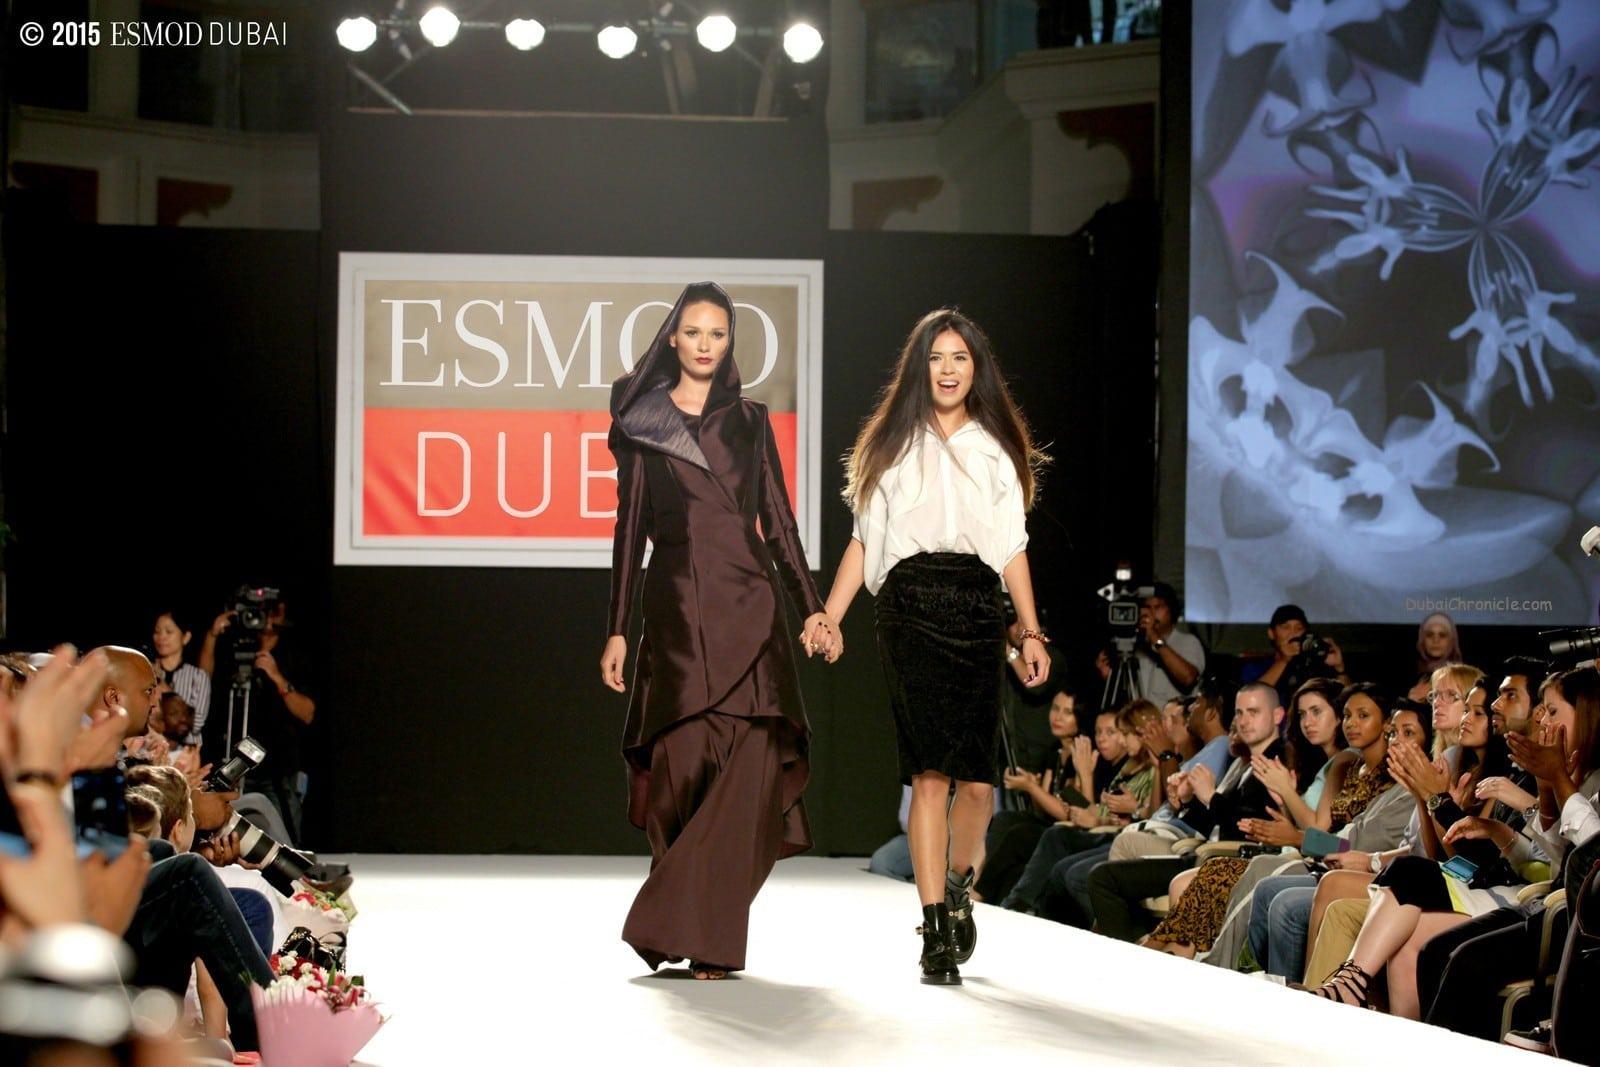 ESMOD Dubai 2015 Fashion Show - Walaa Alaqra